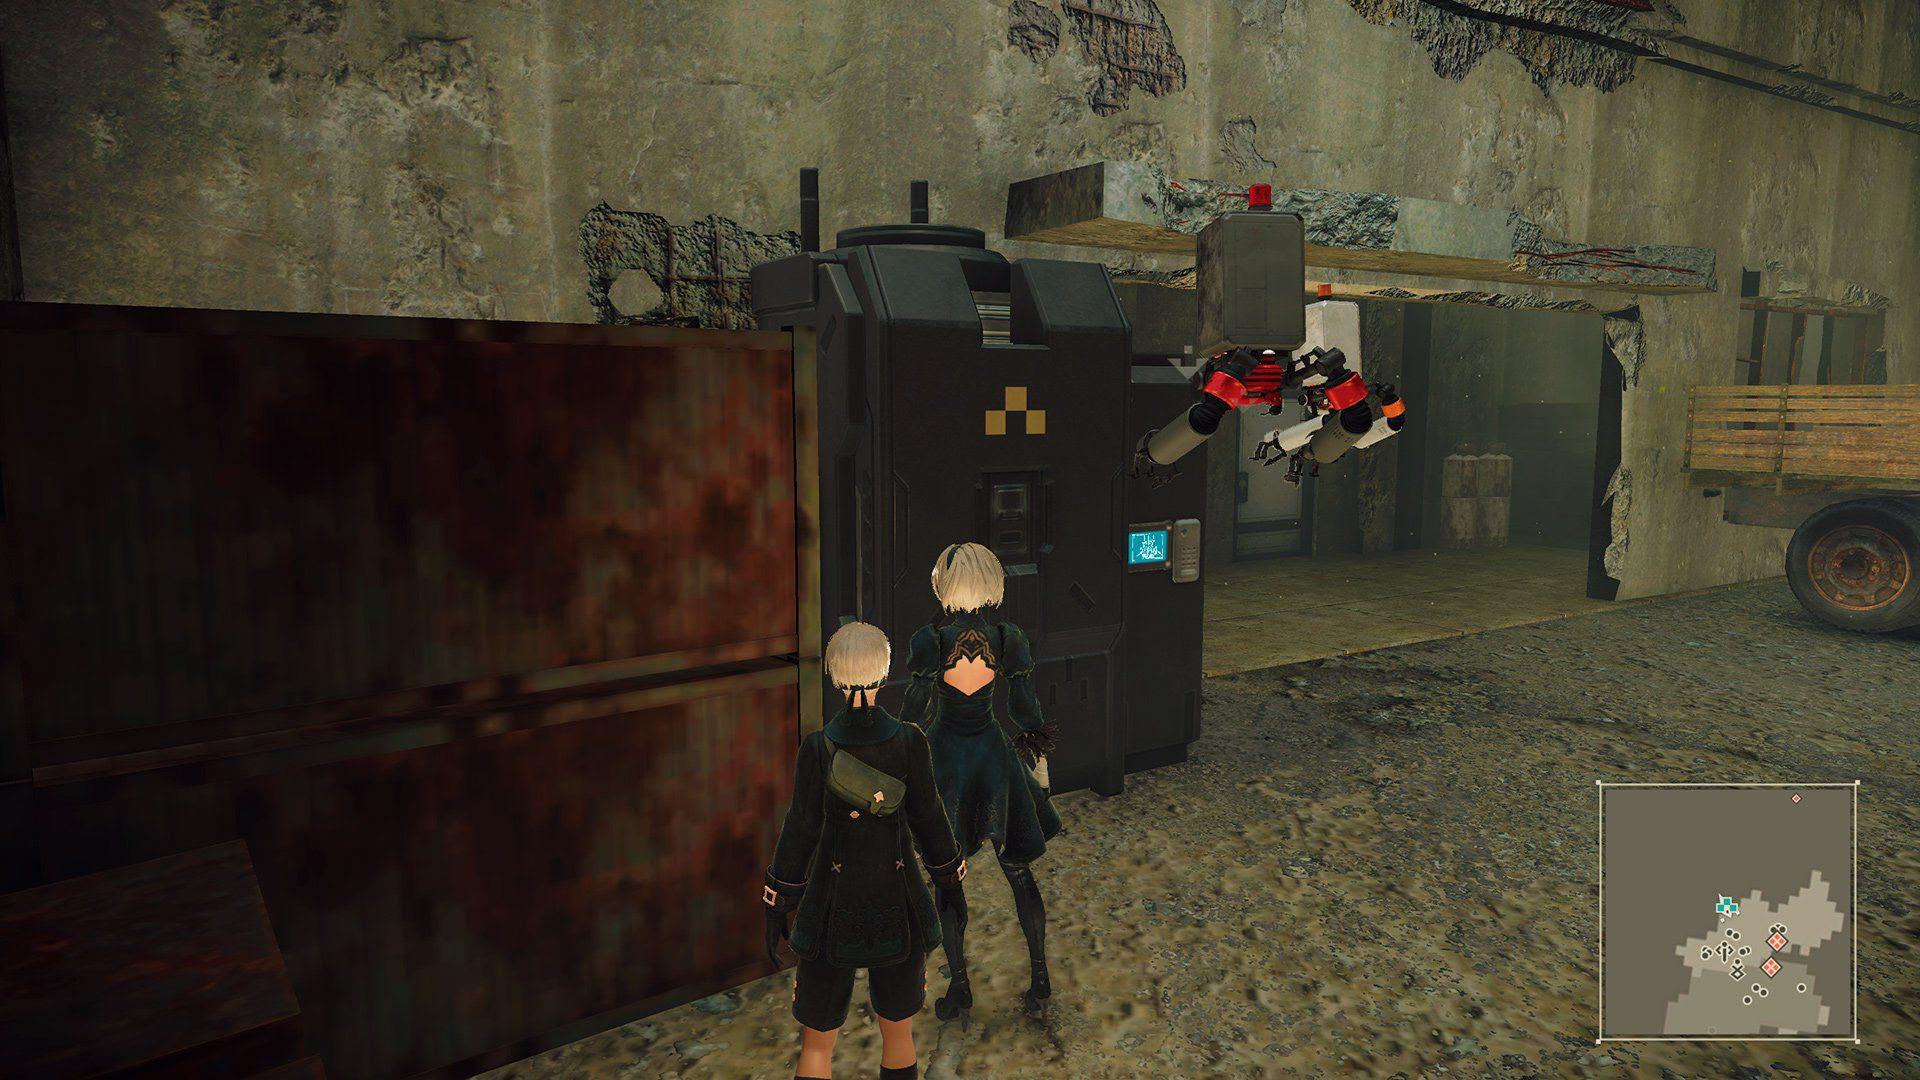 Análisis de NieR: Automata BECOME AS GODS Edition